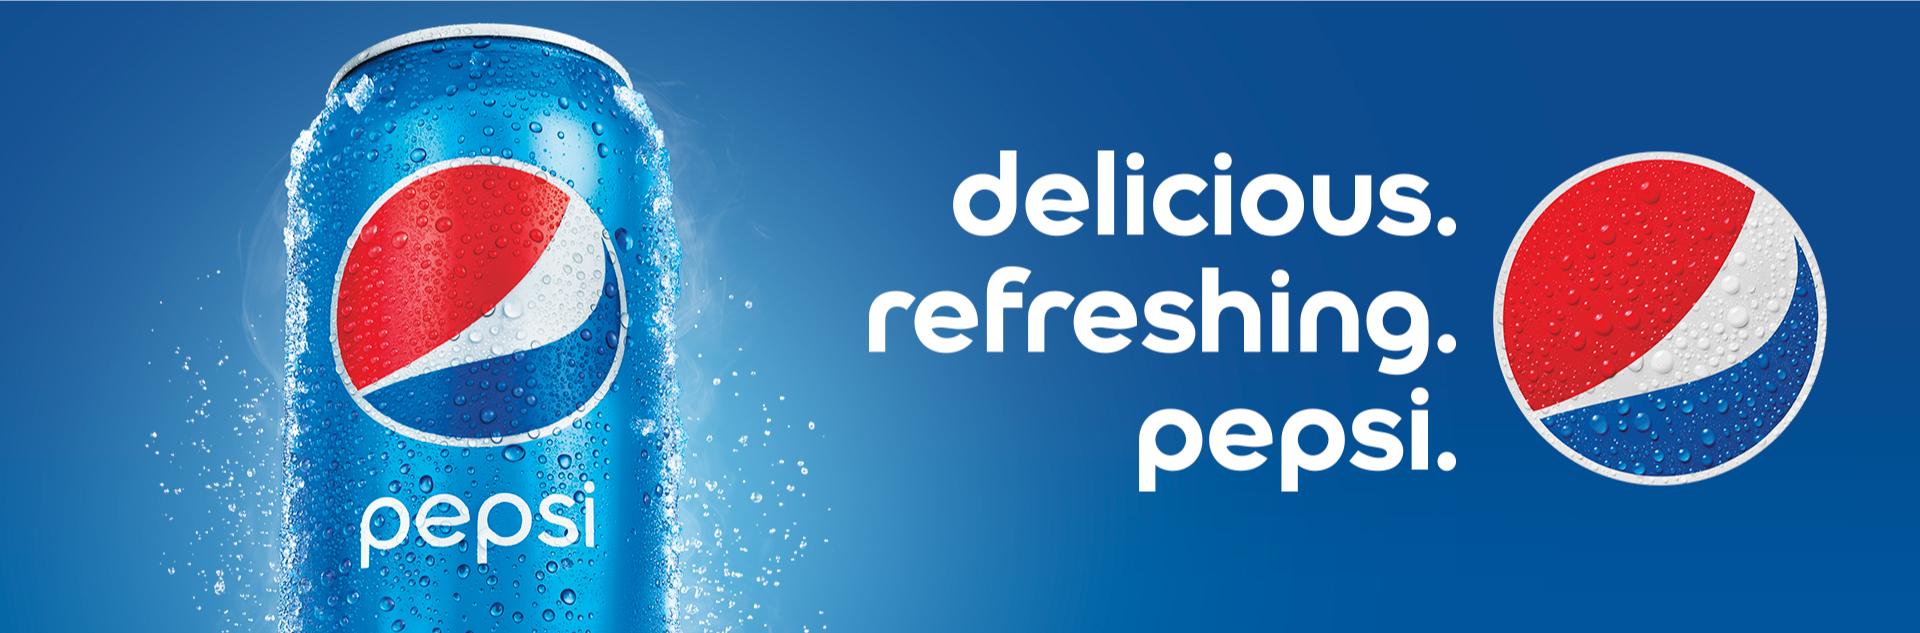 Delicious. Refreshing. Pepsi.